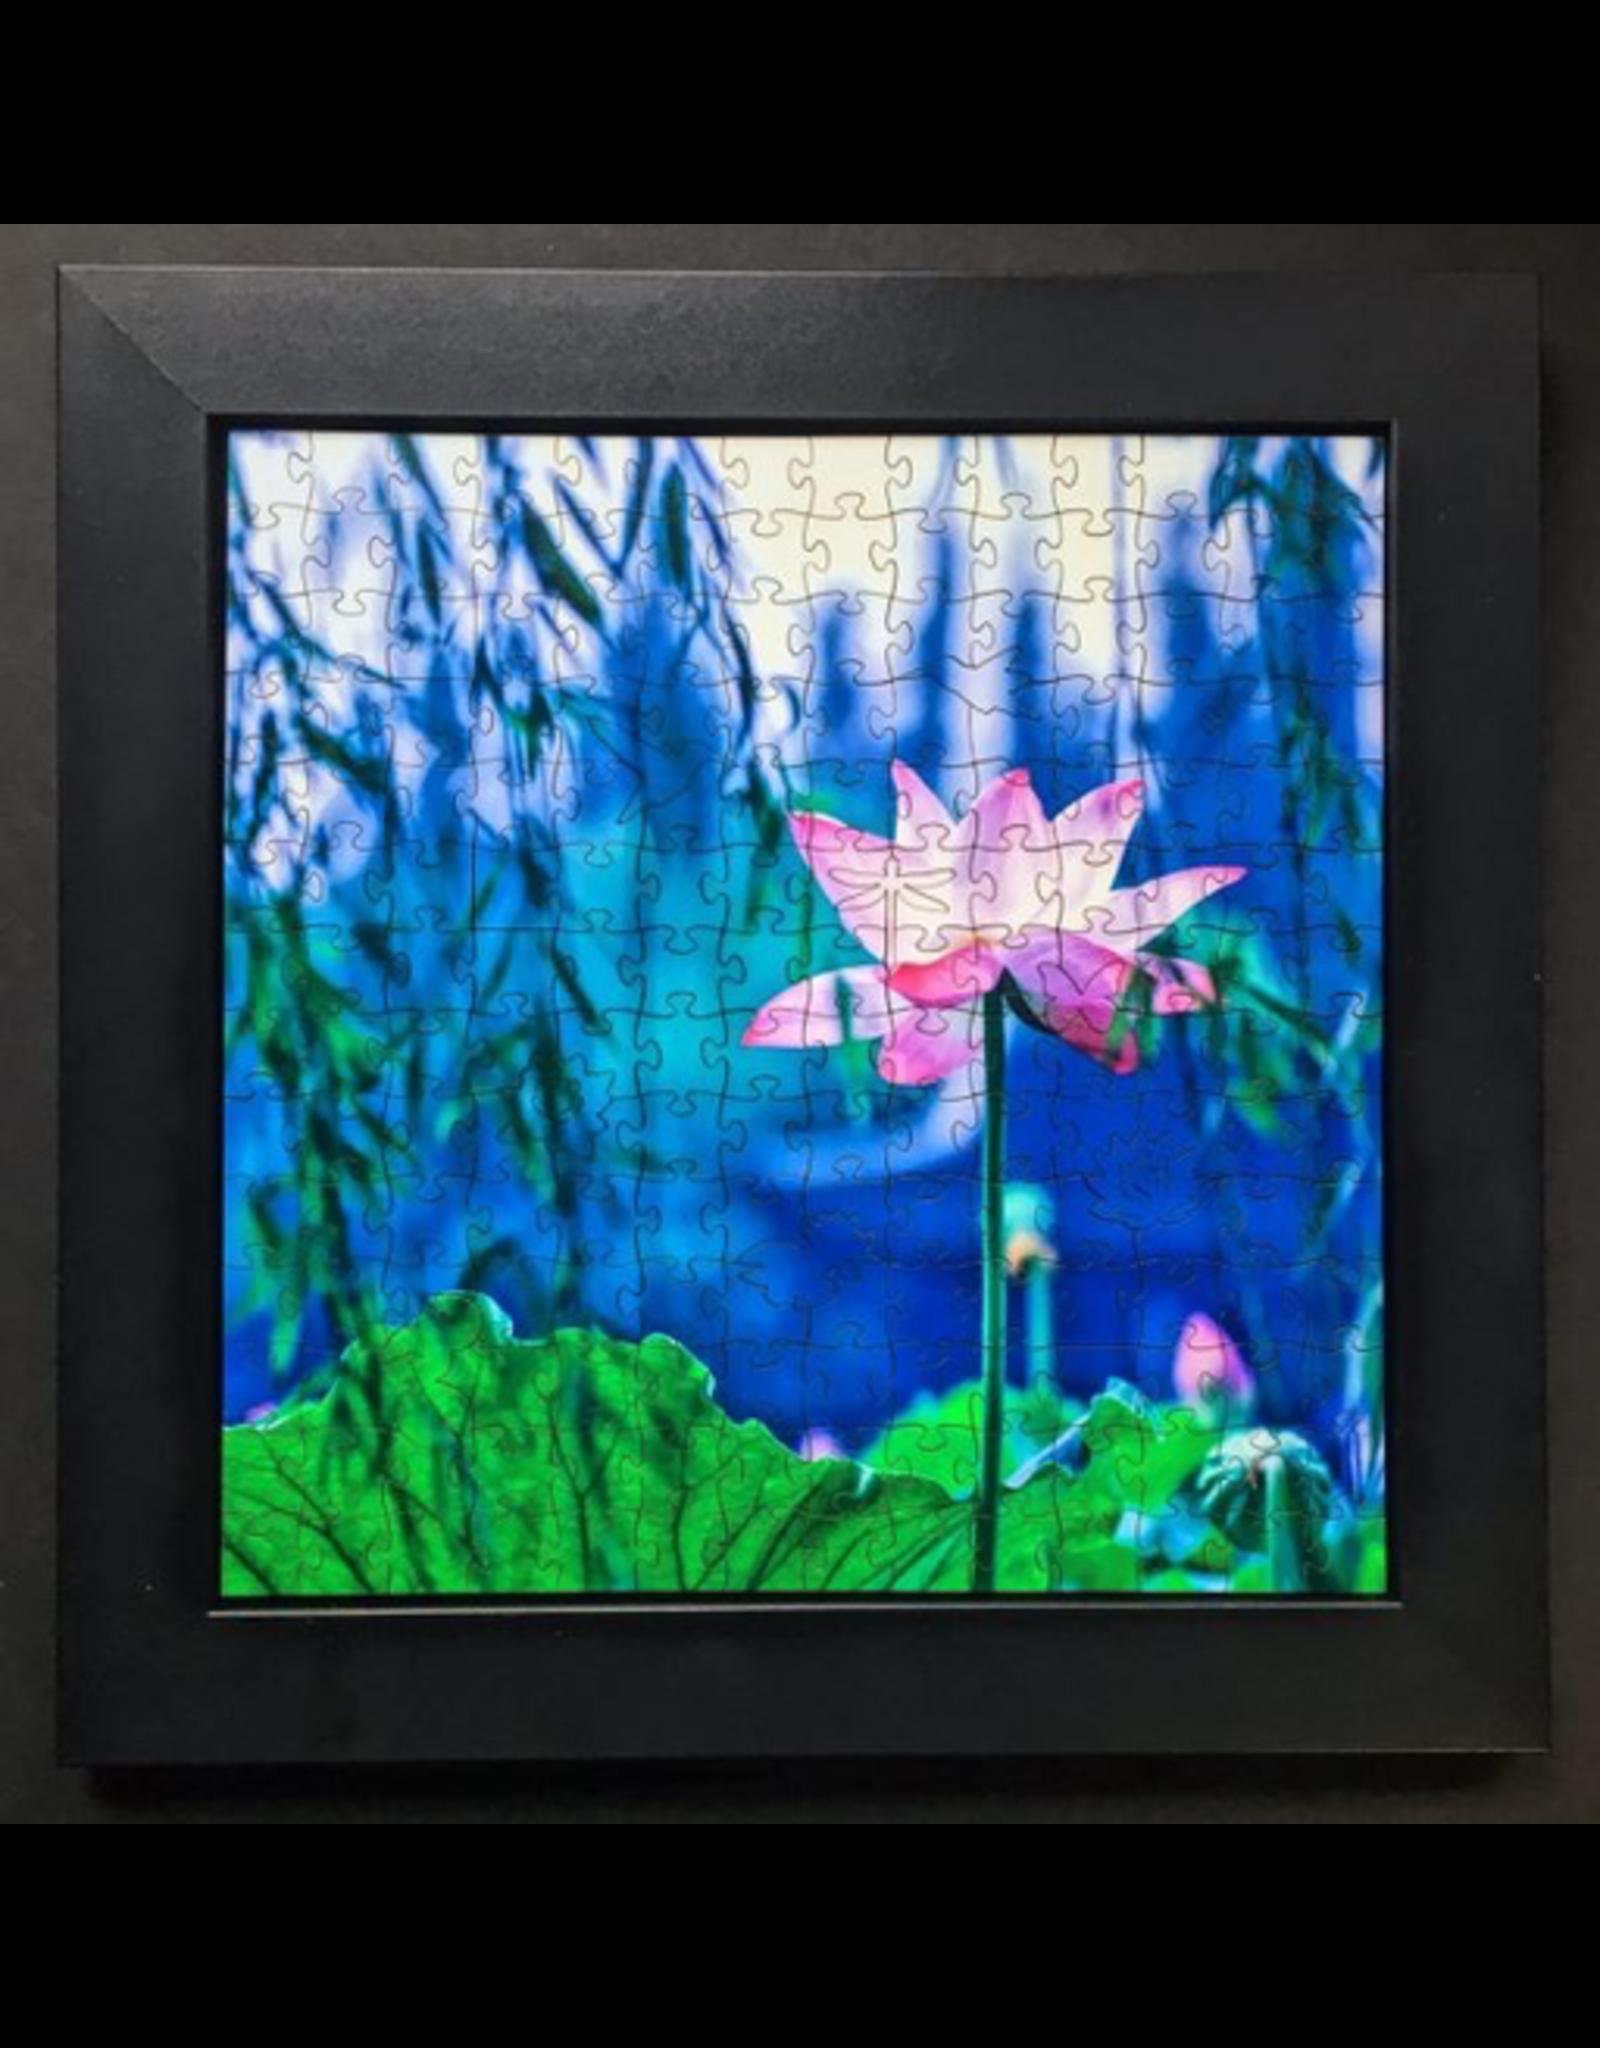 "Zen Art & Design Display Tray (Sm, Black, ZEN Puzzles sold separately, 10"" x 10"")"